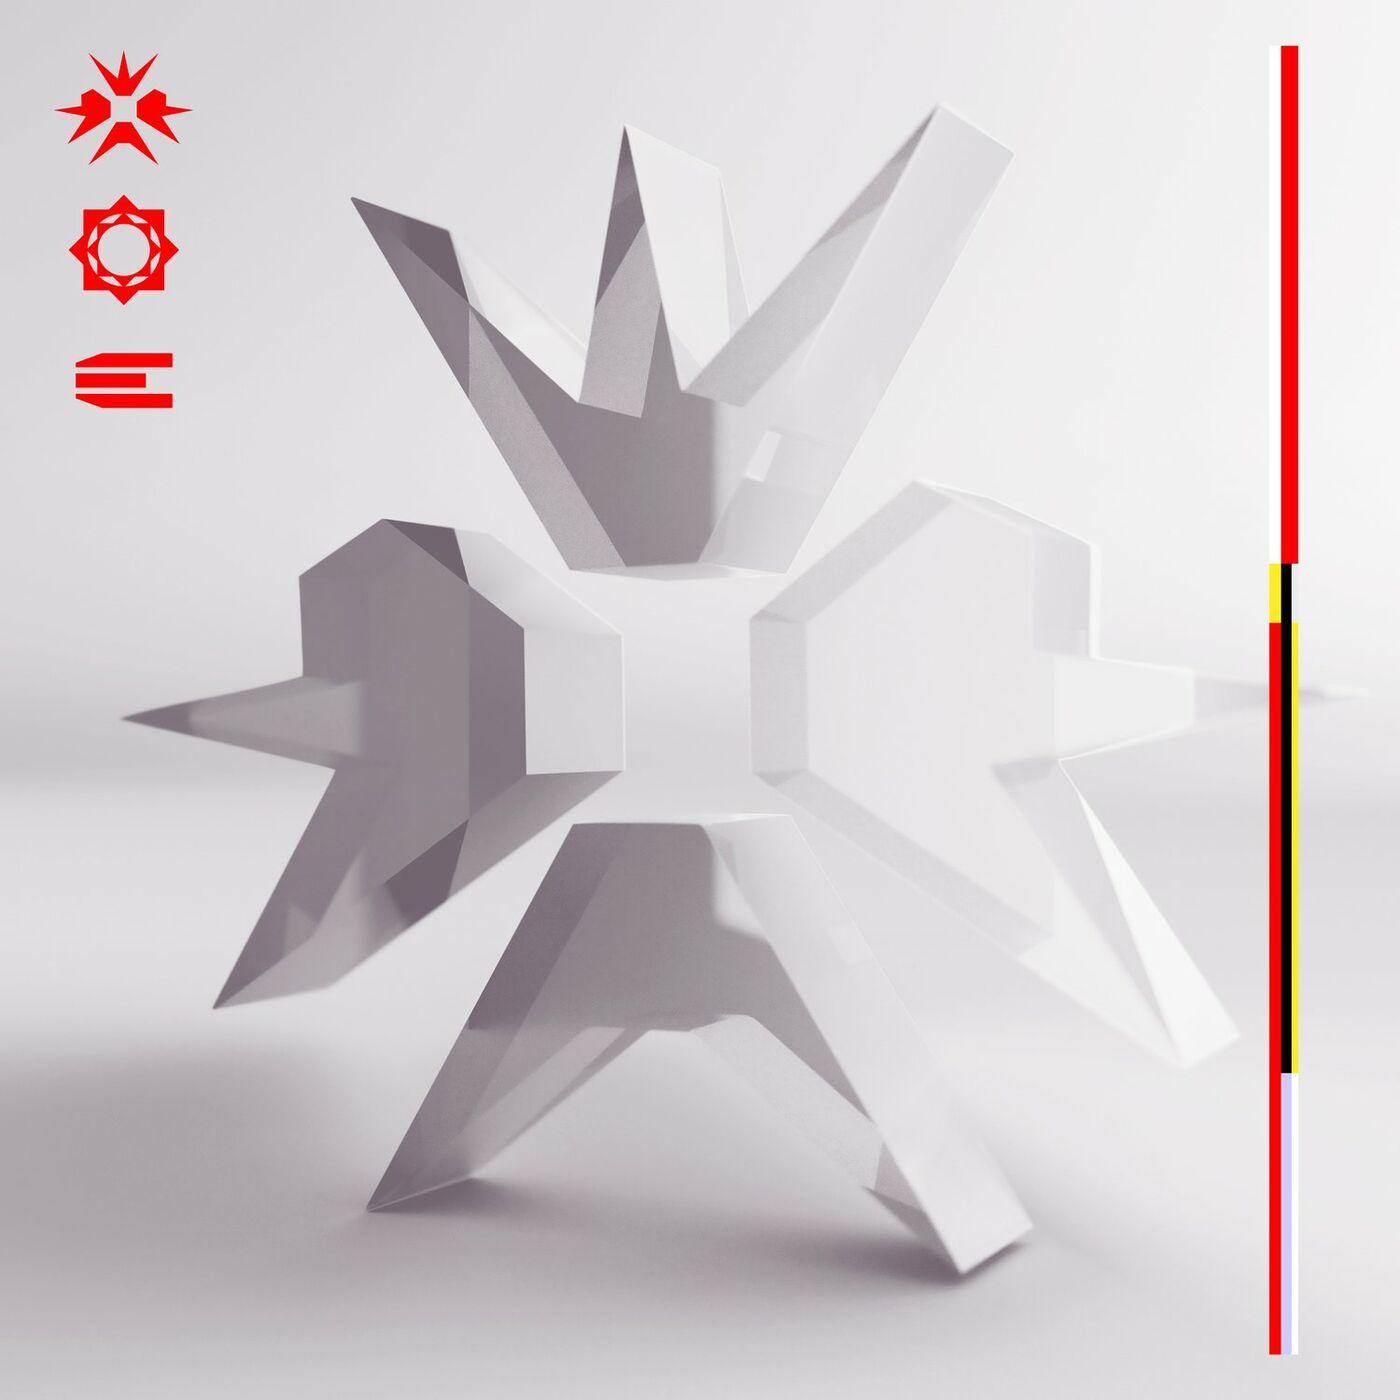 ERRA - Snowblood [single] (2020)